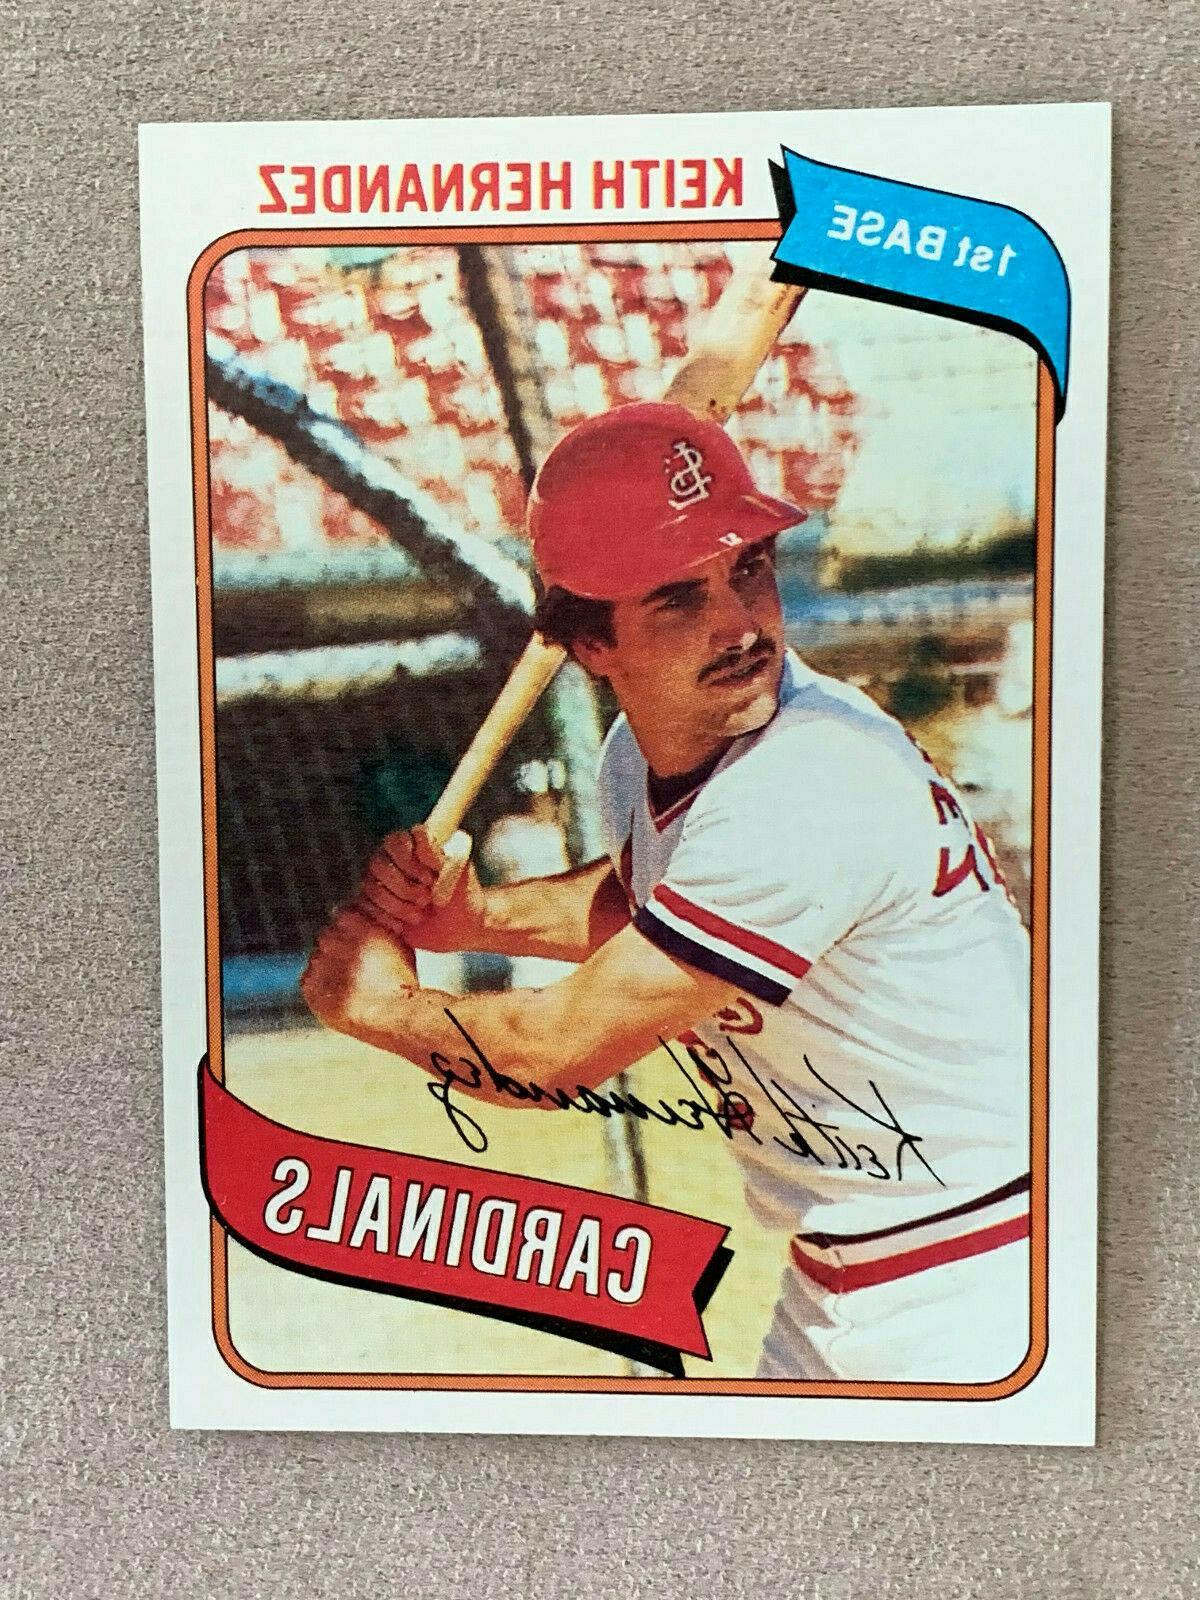 1980 baseball card 321 keith hernandez st